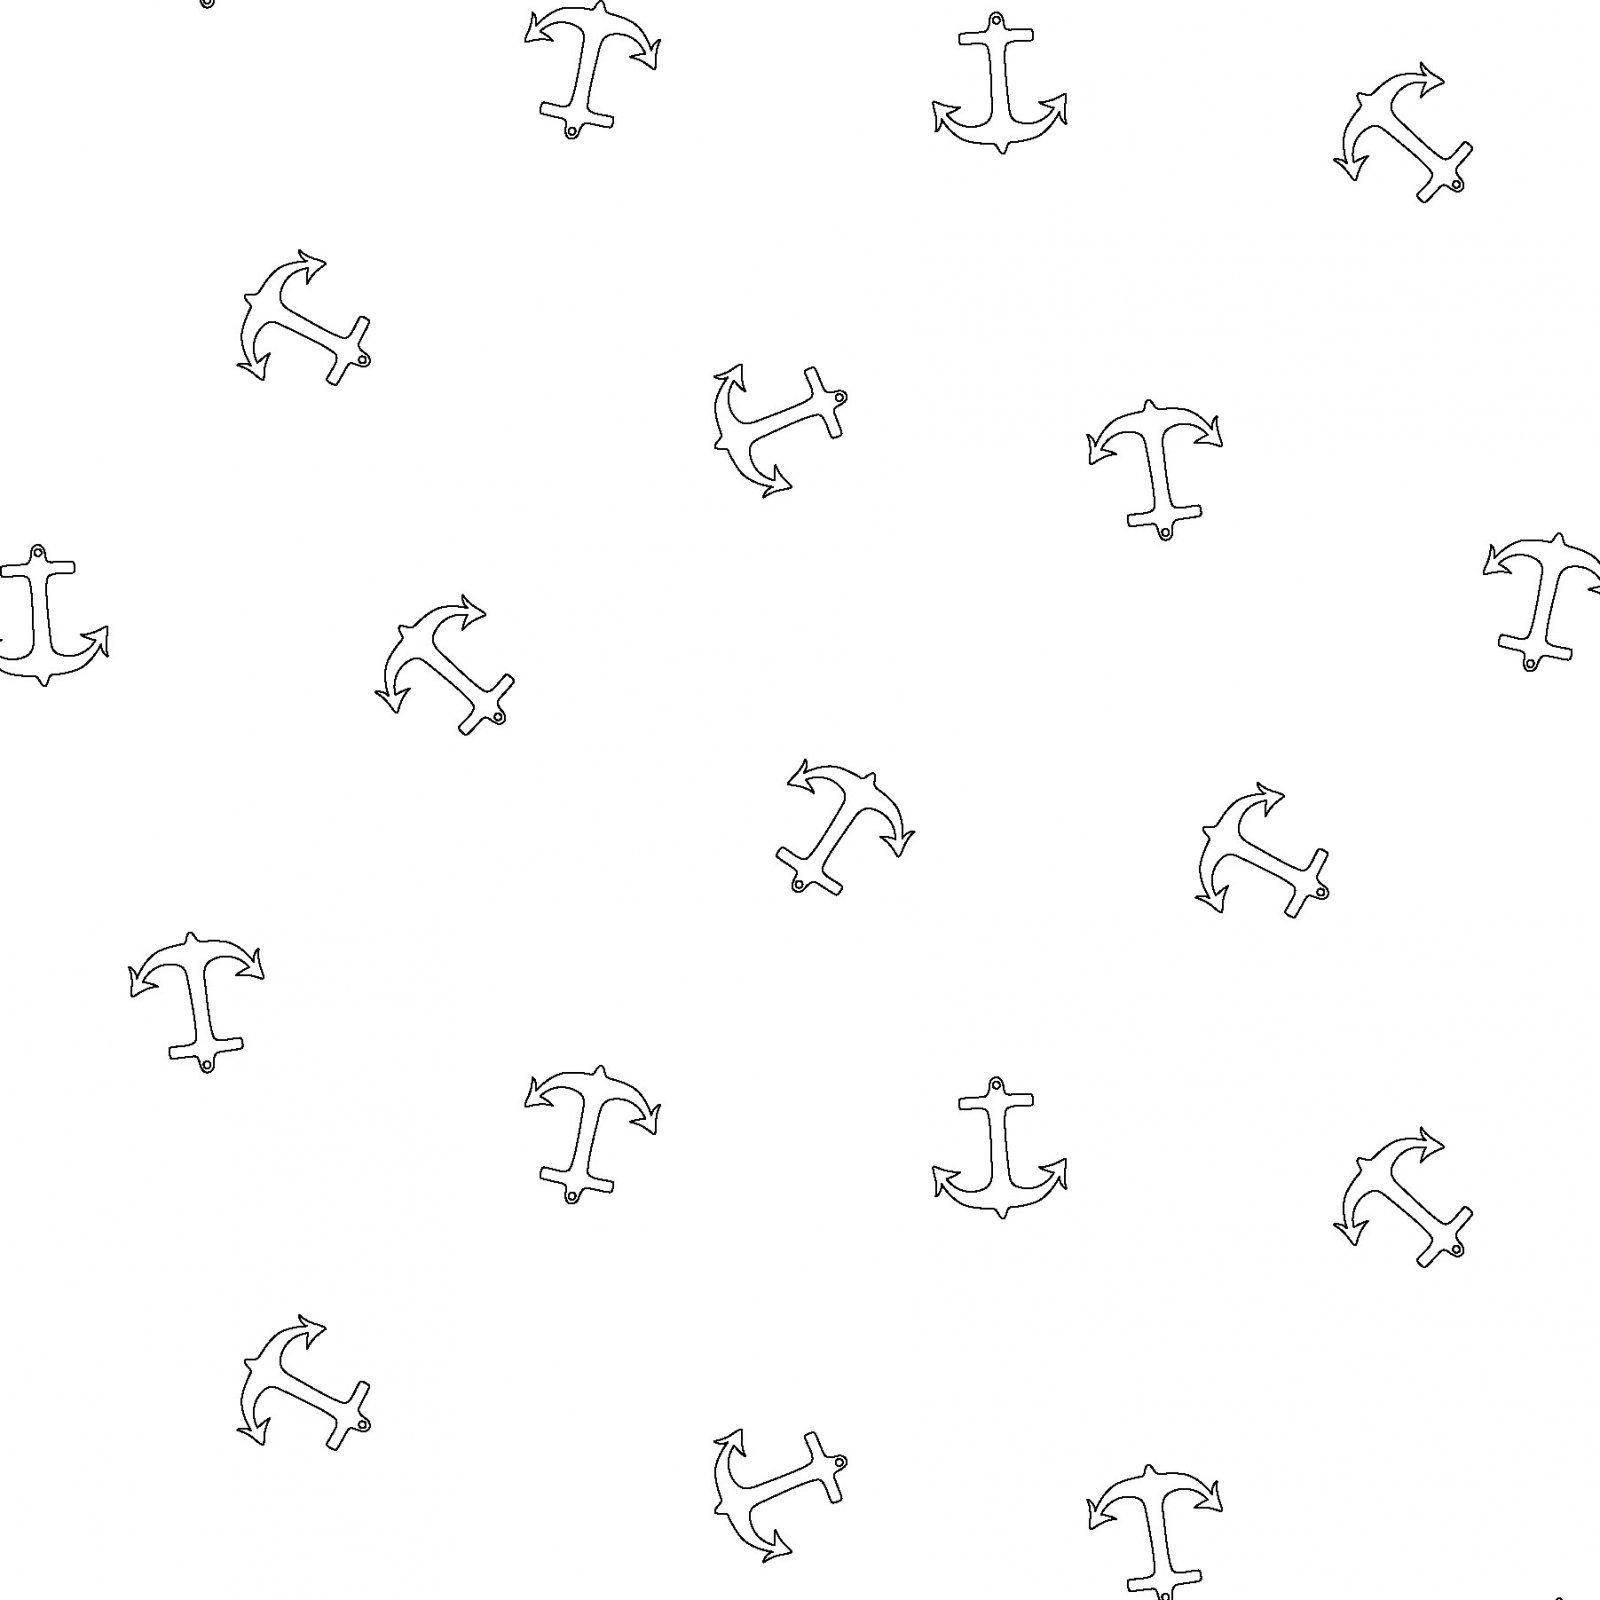 Ramblings Fun - Anchors (White on White: Refer to Description)